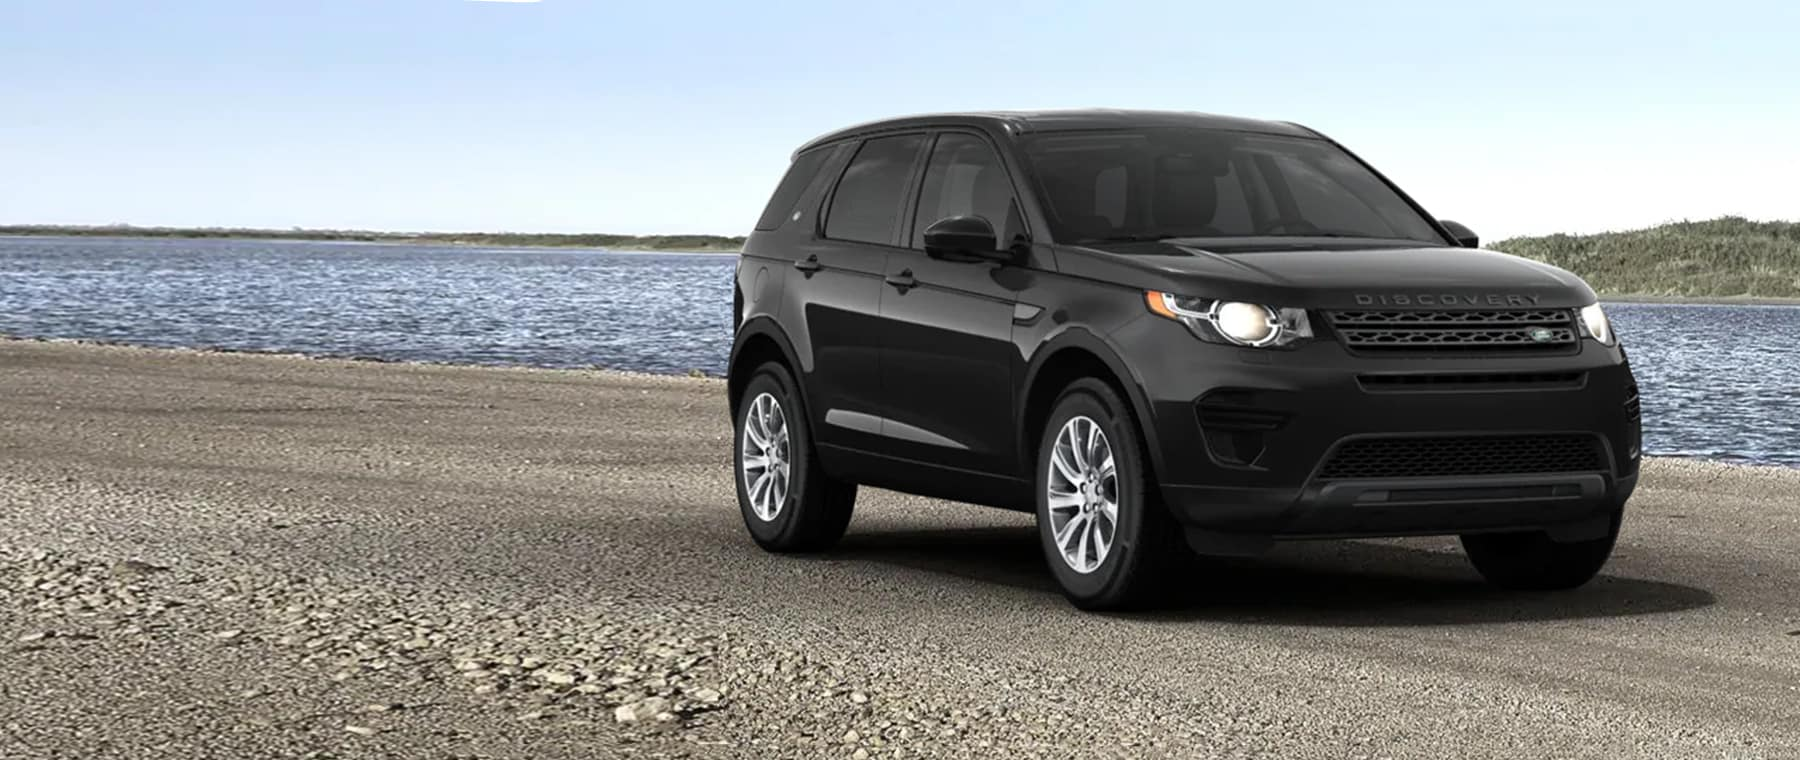 Used Cars Charleston Sc >> Land Rover Dealership Charleston Sc Mount Pleasant